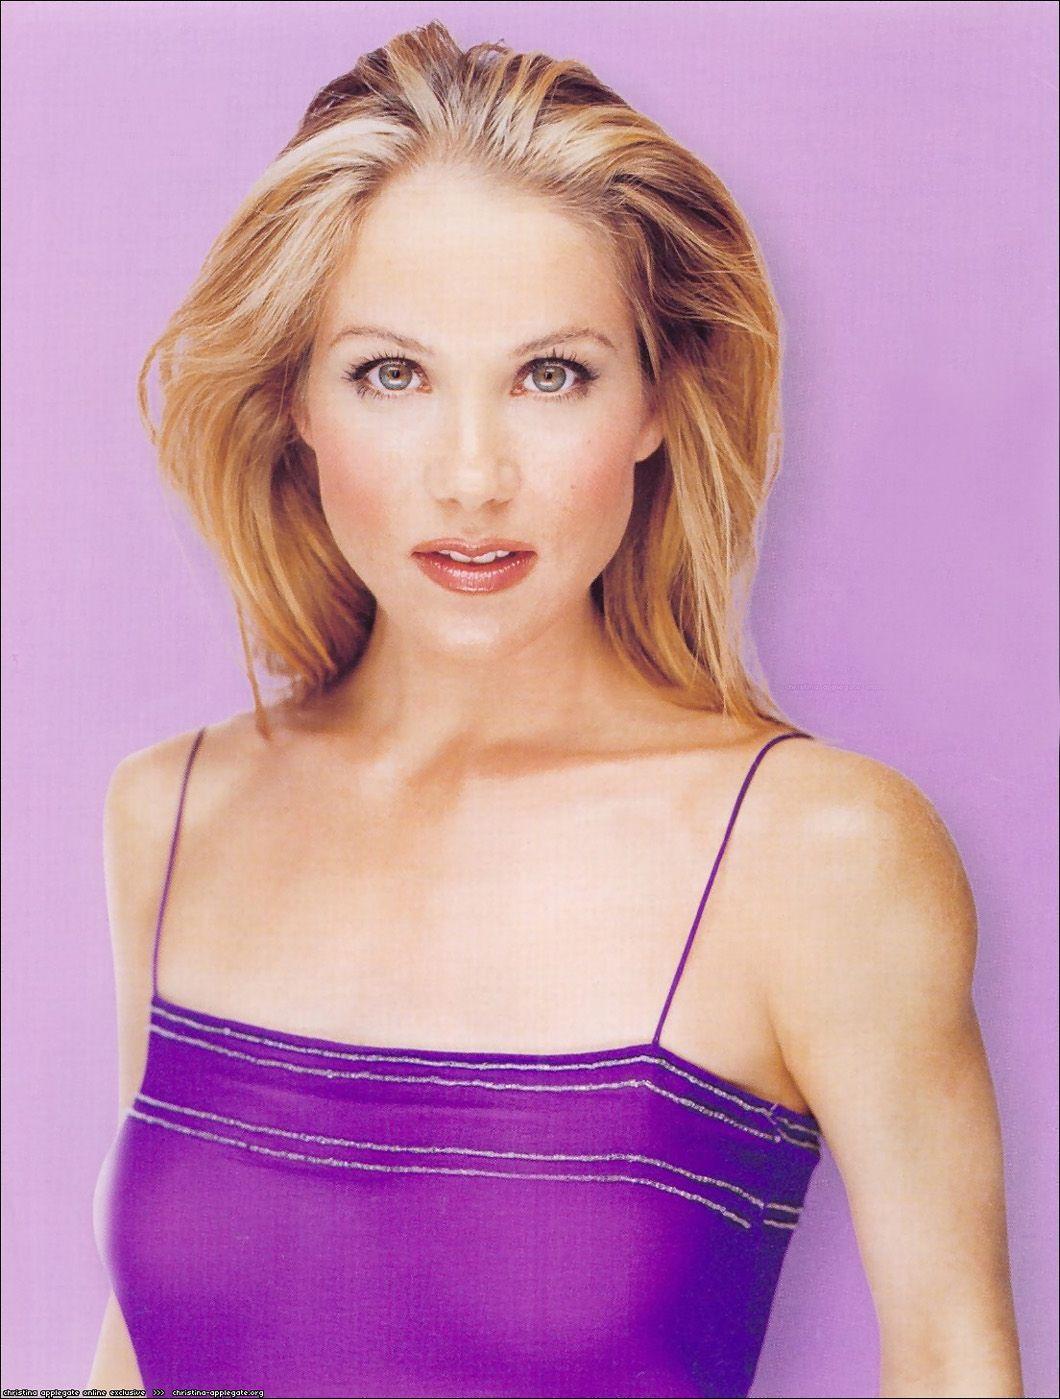 Ruby Miller (actress)